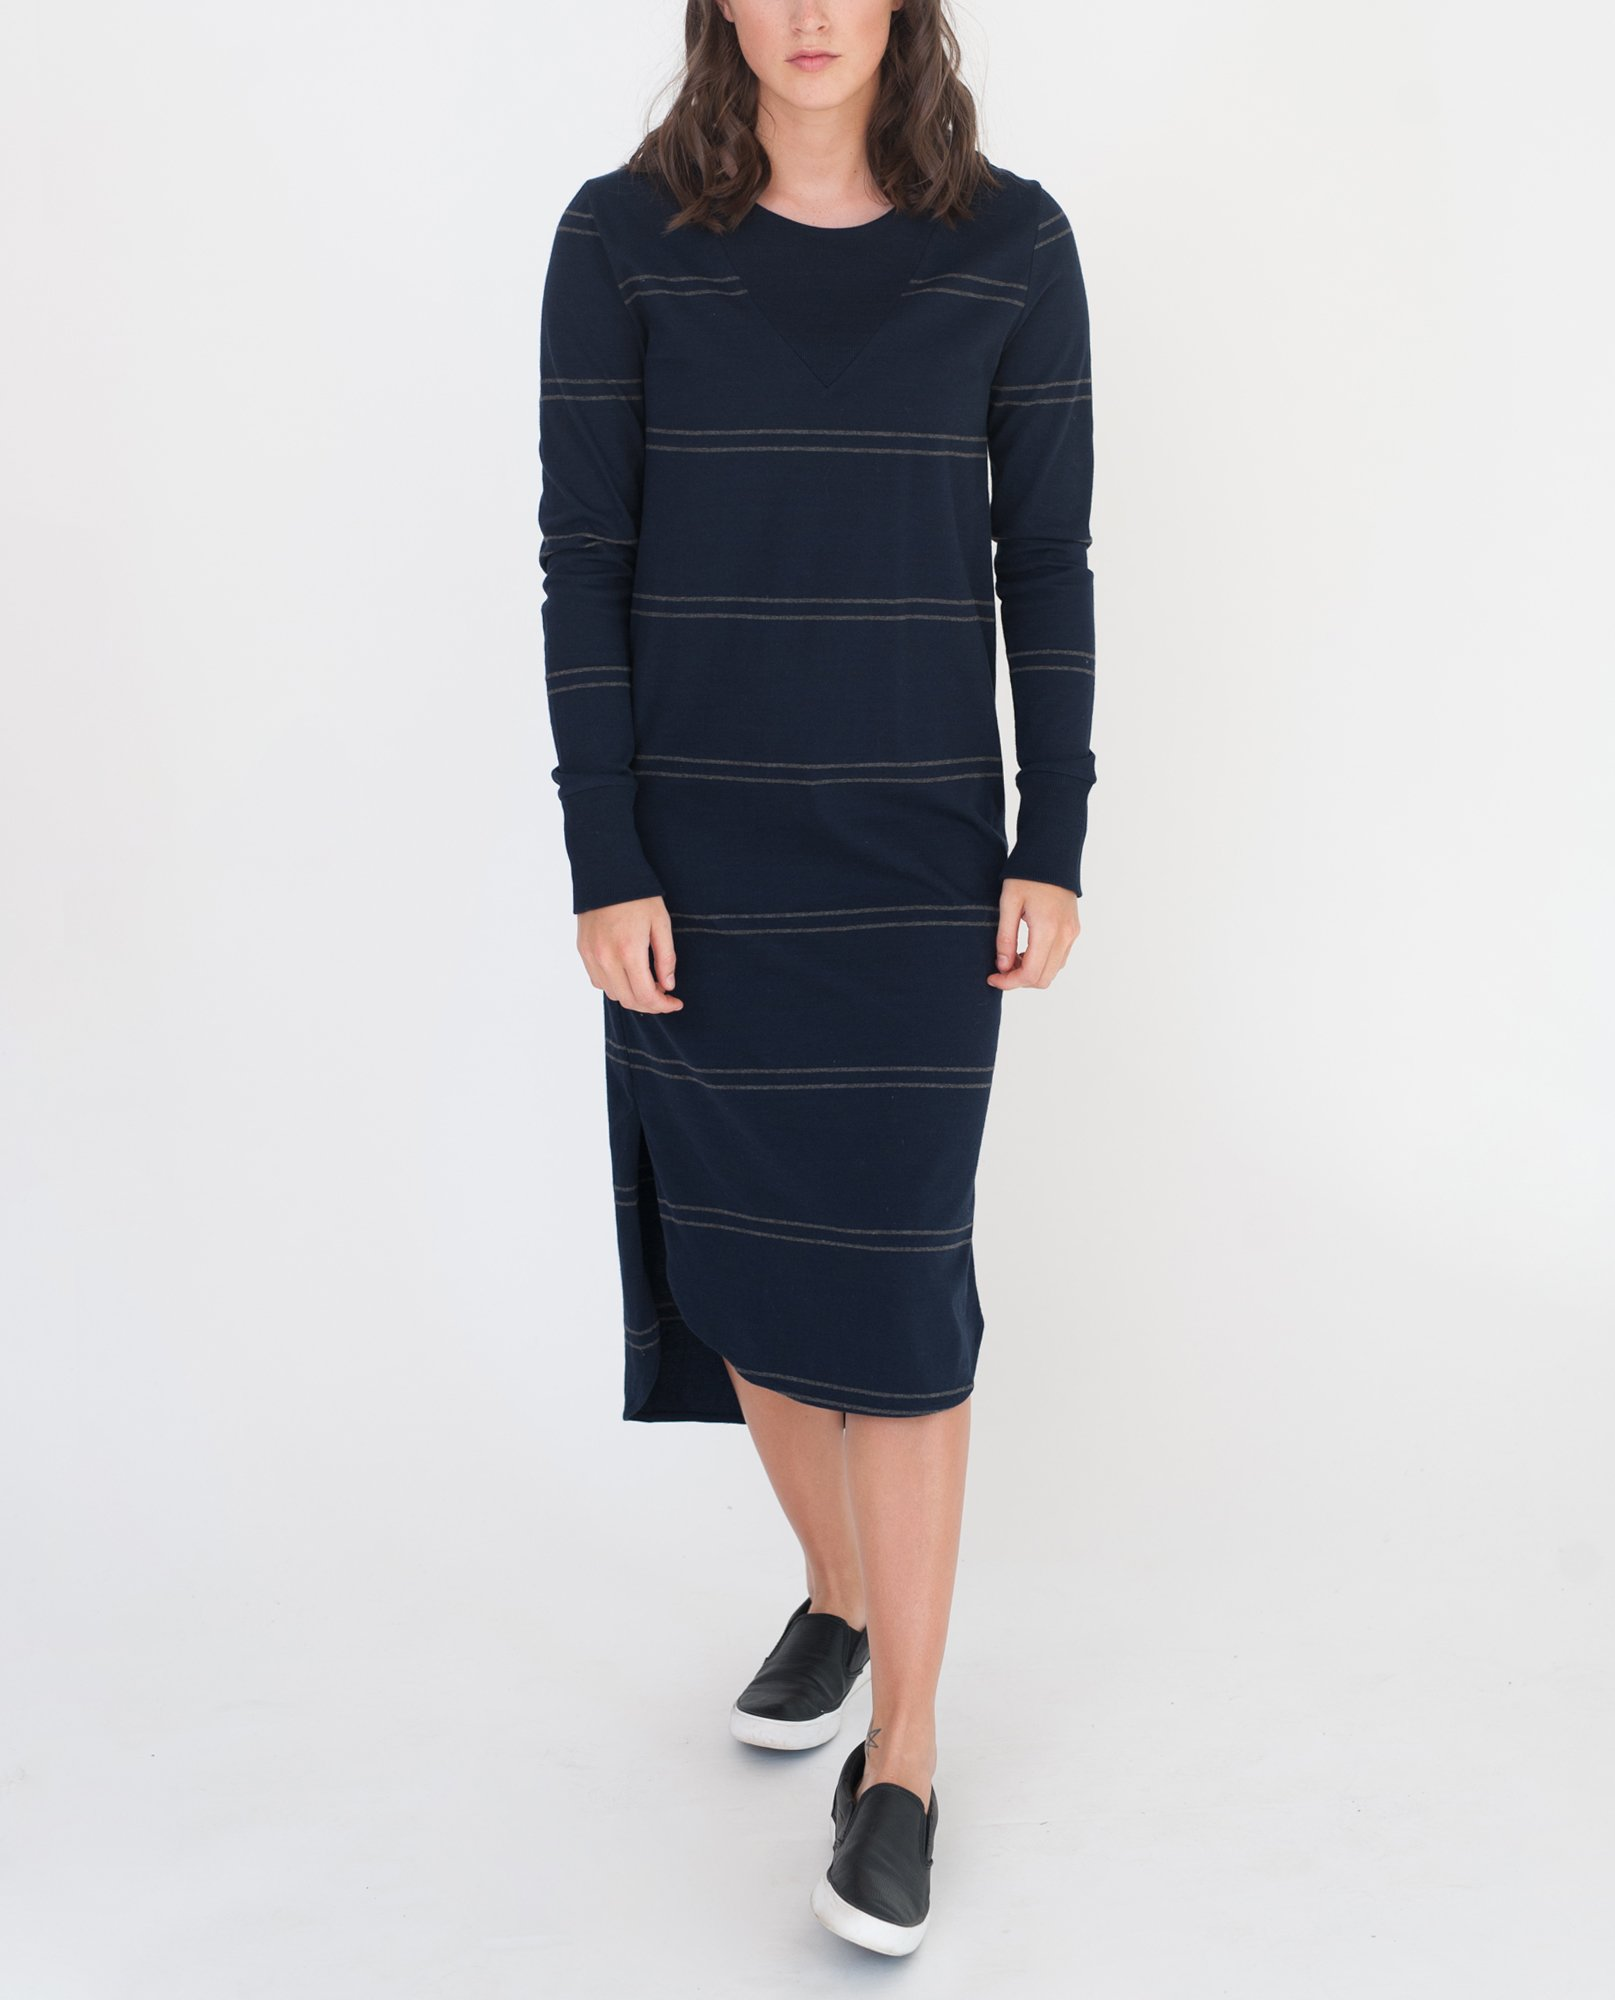 GLORIA Organic Cotton Dress In Navy And Dark Grey from Beaumont Organic